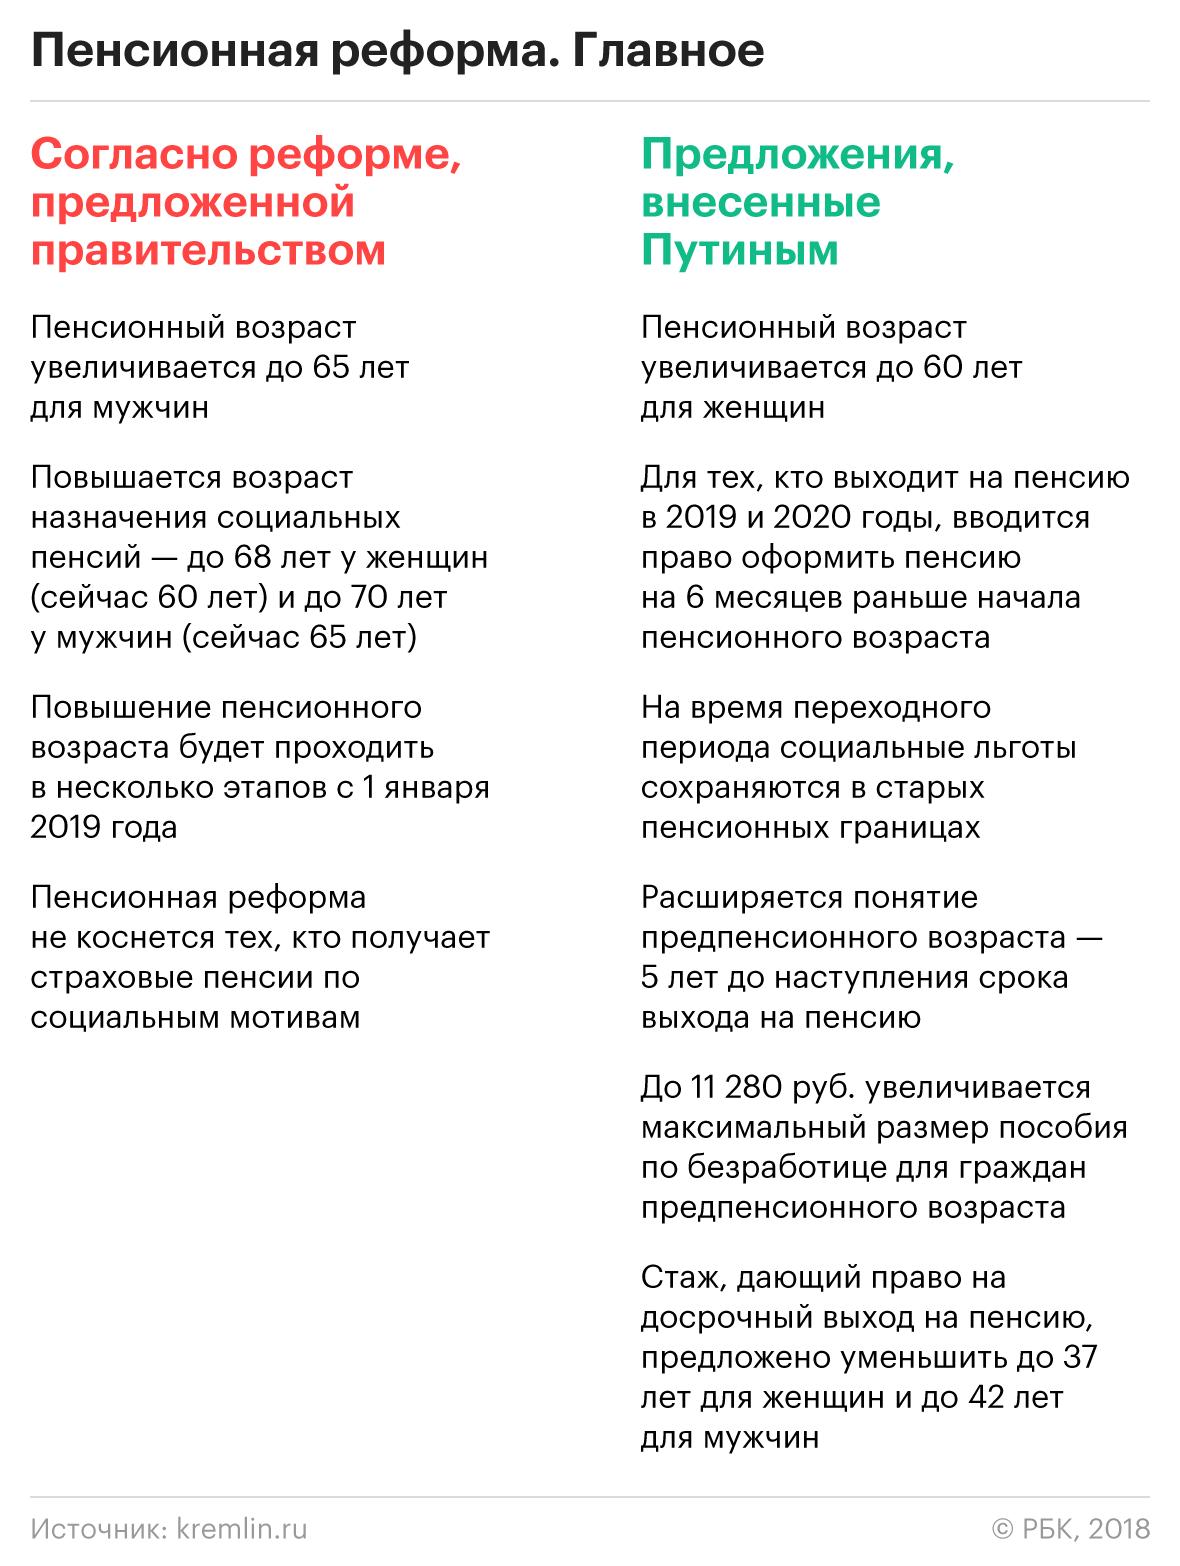 https://s0.rbk.ru/v6_top_pics/media/img/4/87/755355446320874.png